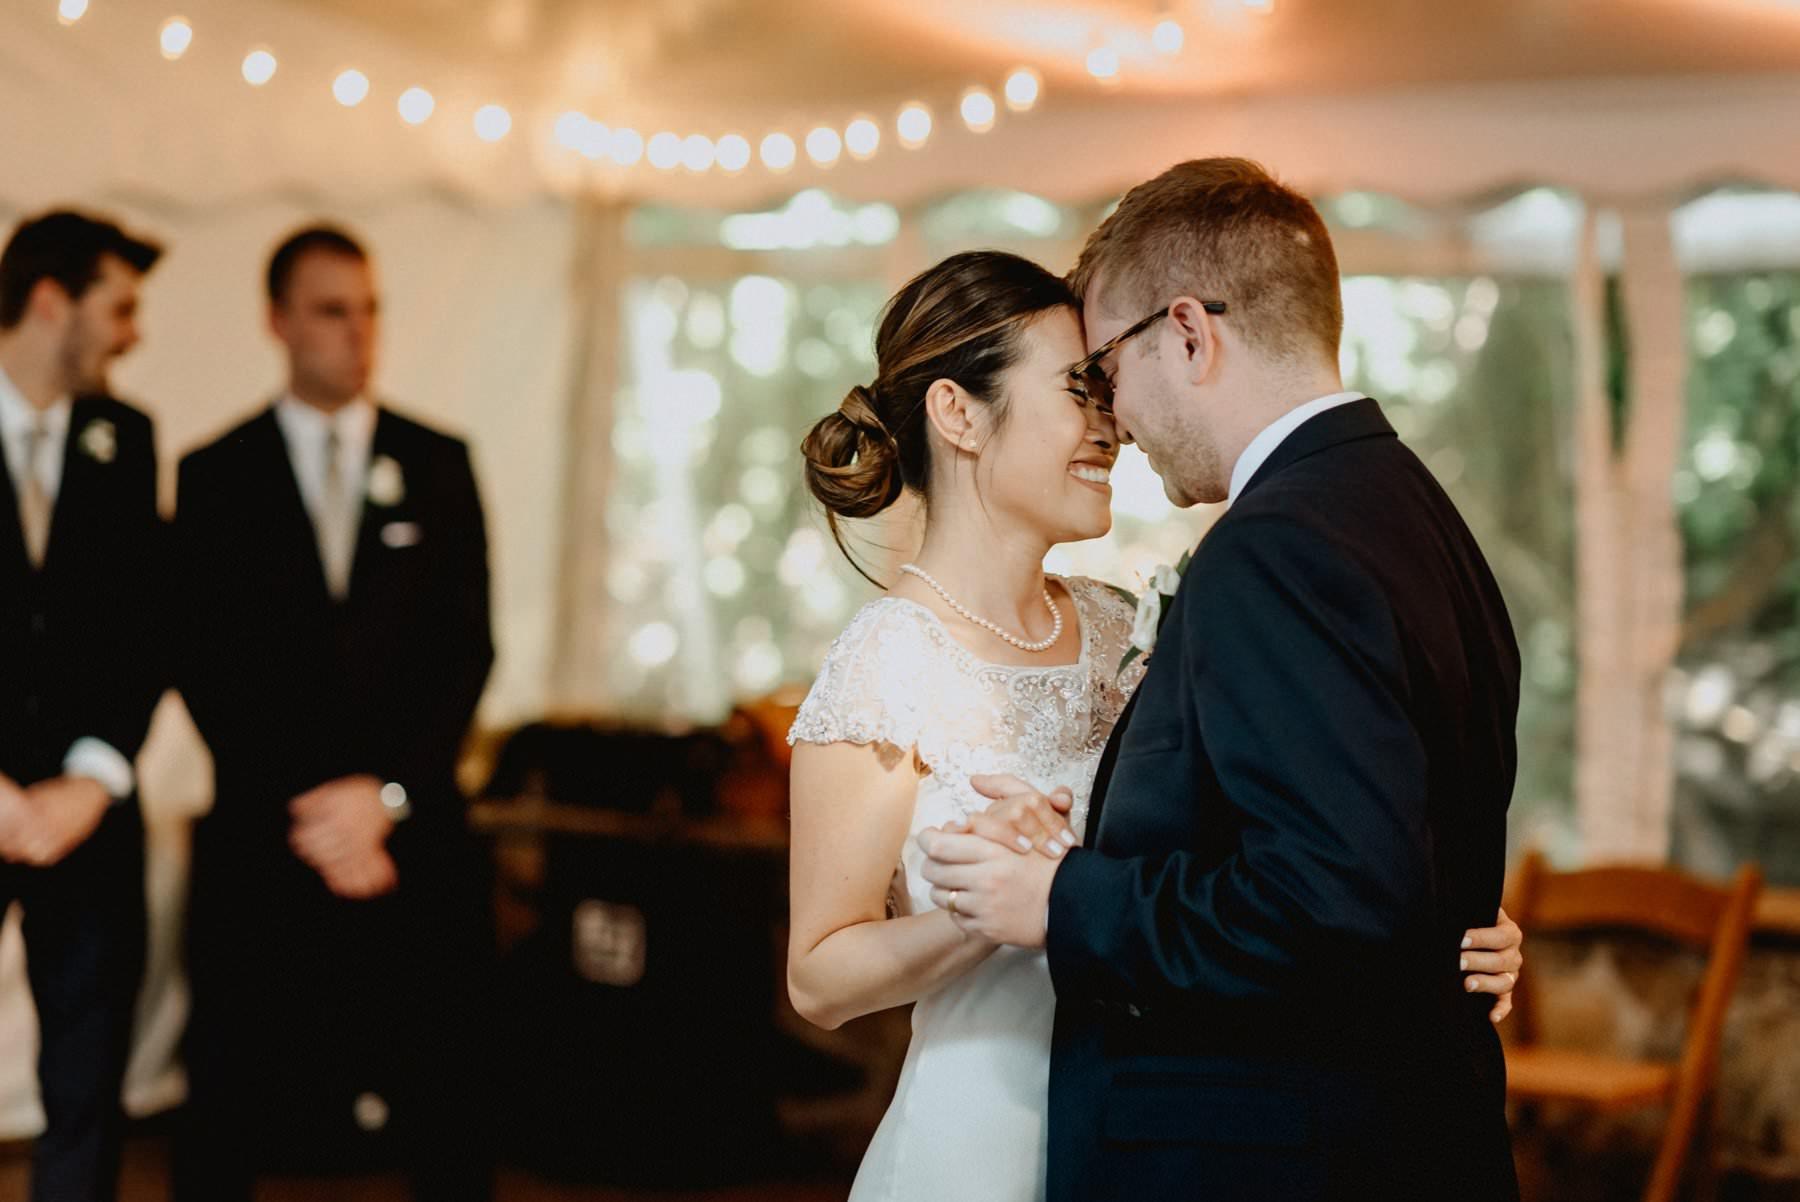 Appleford-estate-wedding-118.jpg